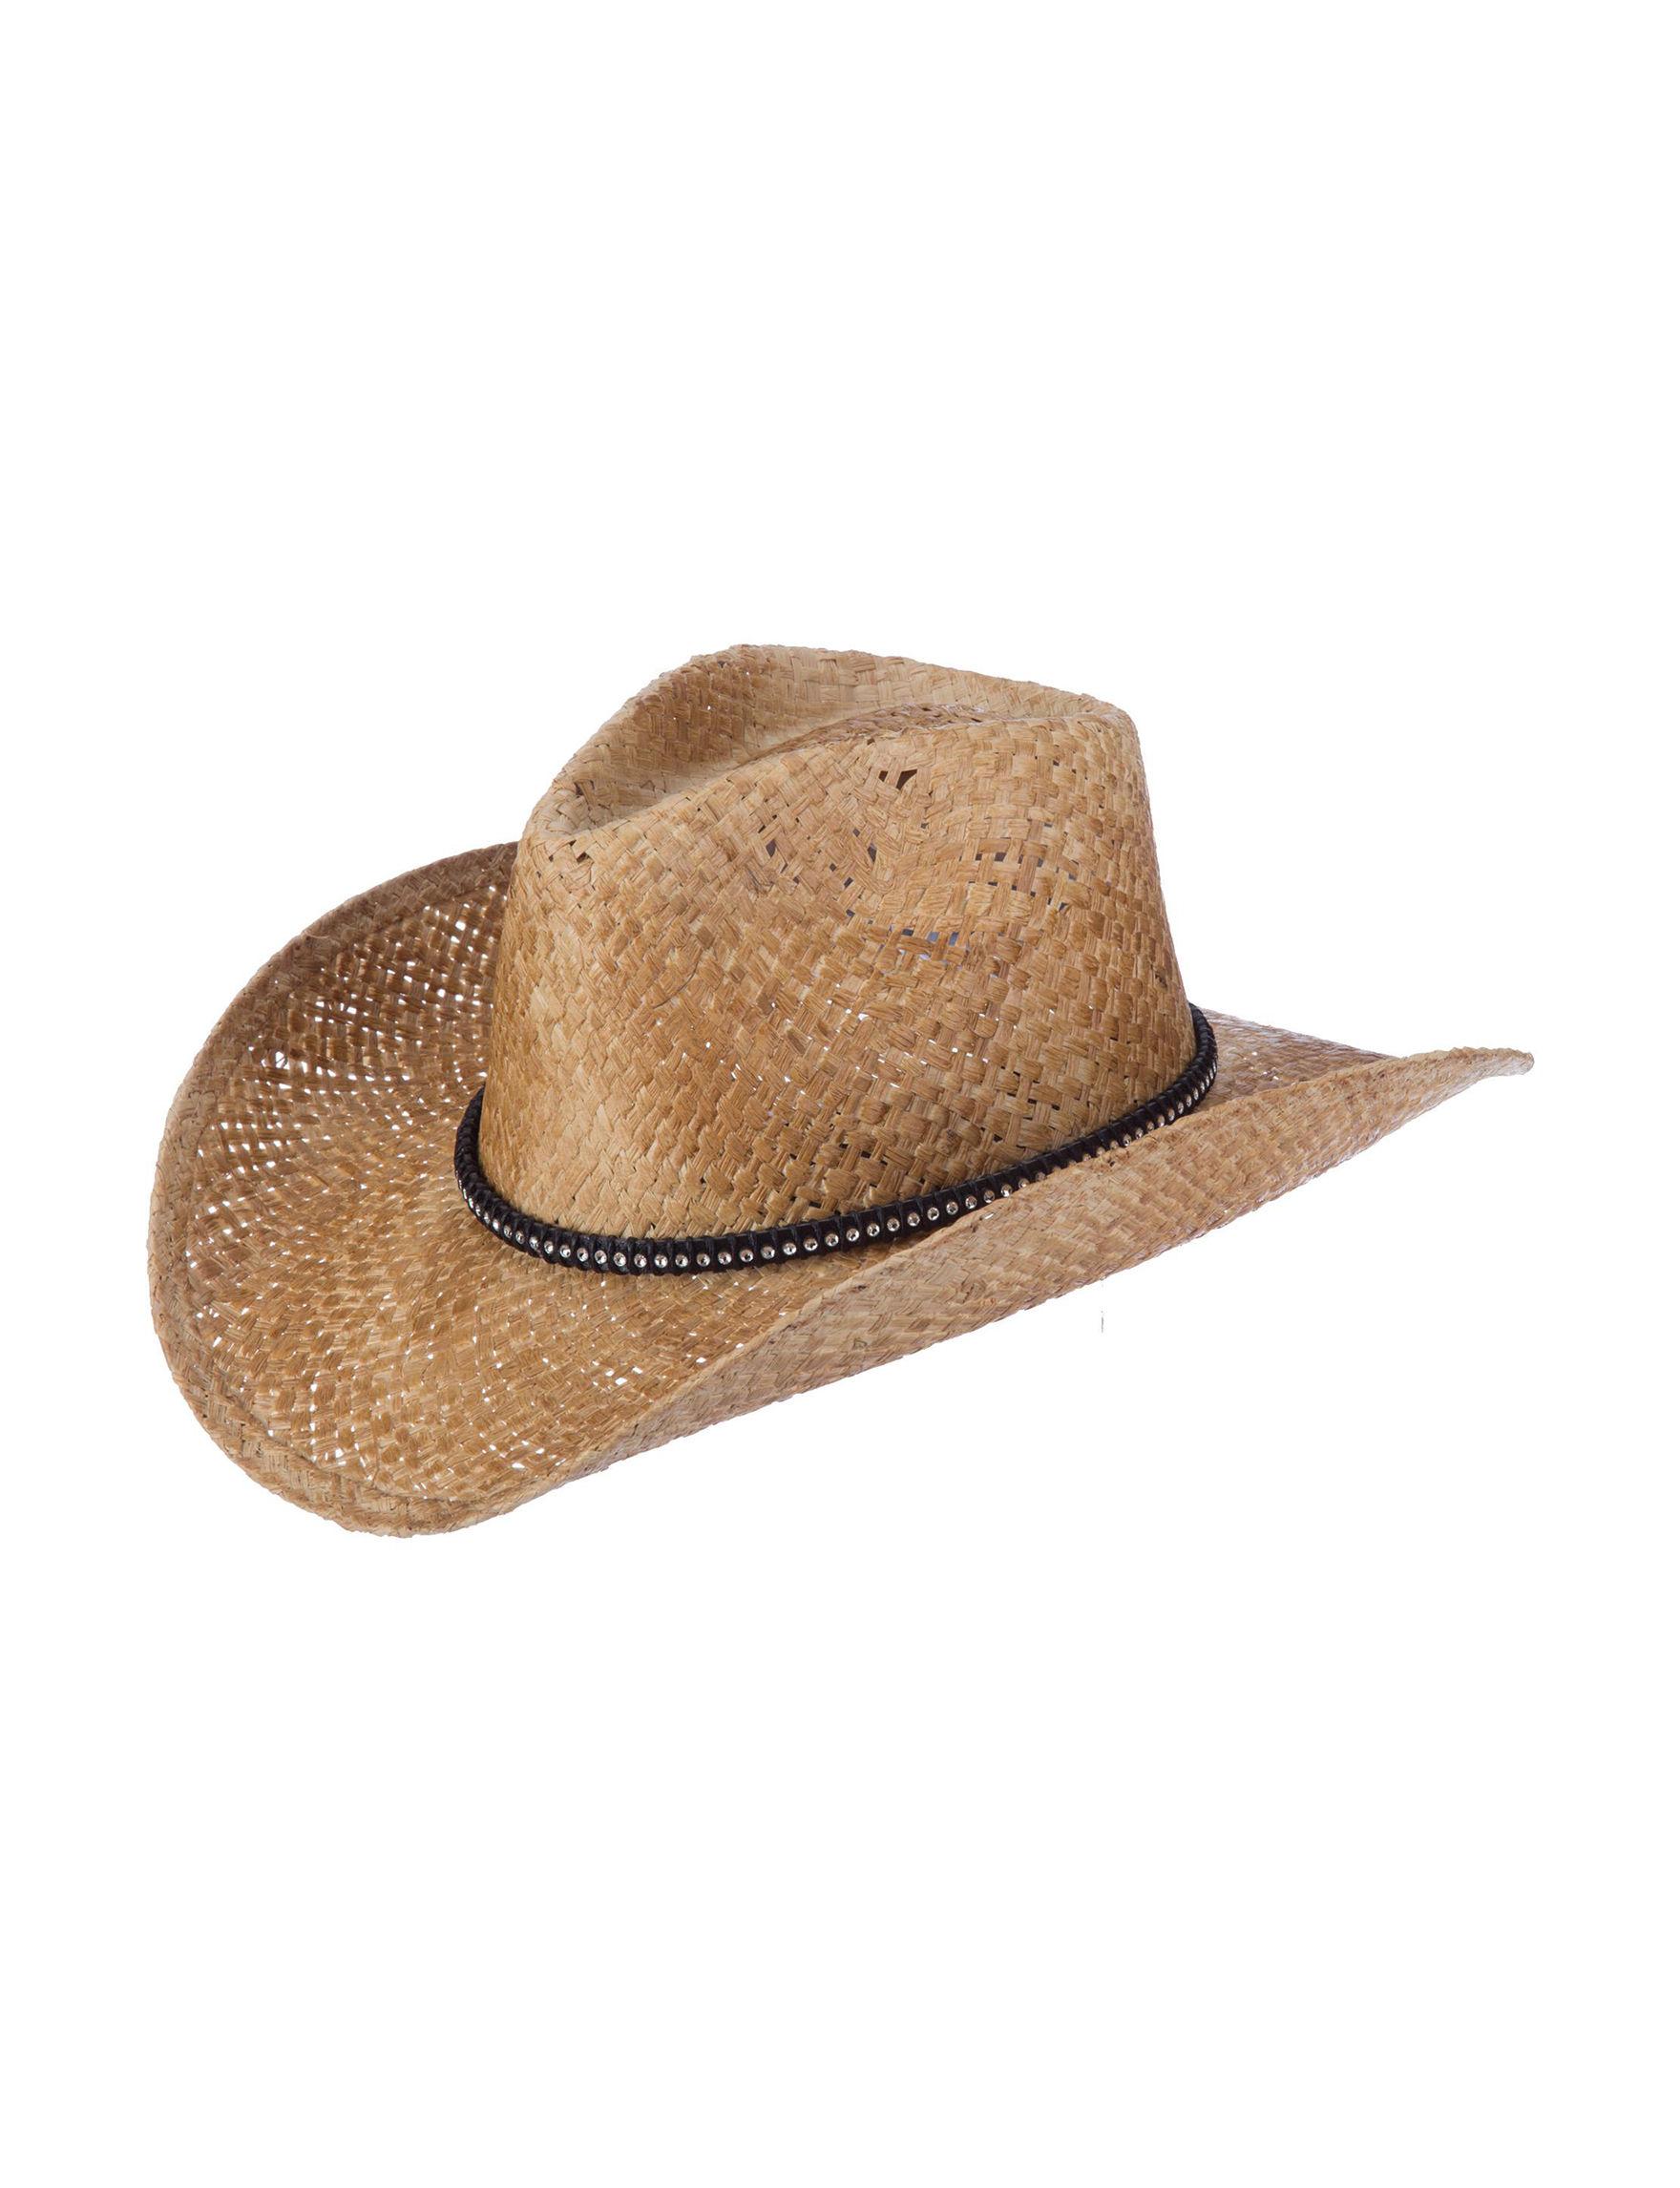 Scala Tea Hats & Headwear